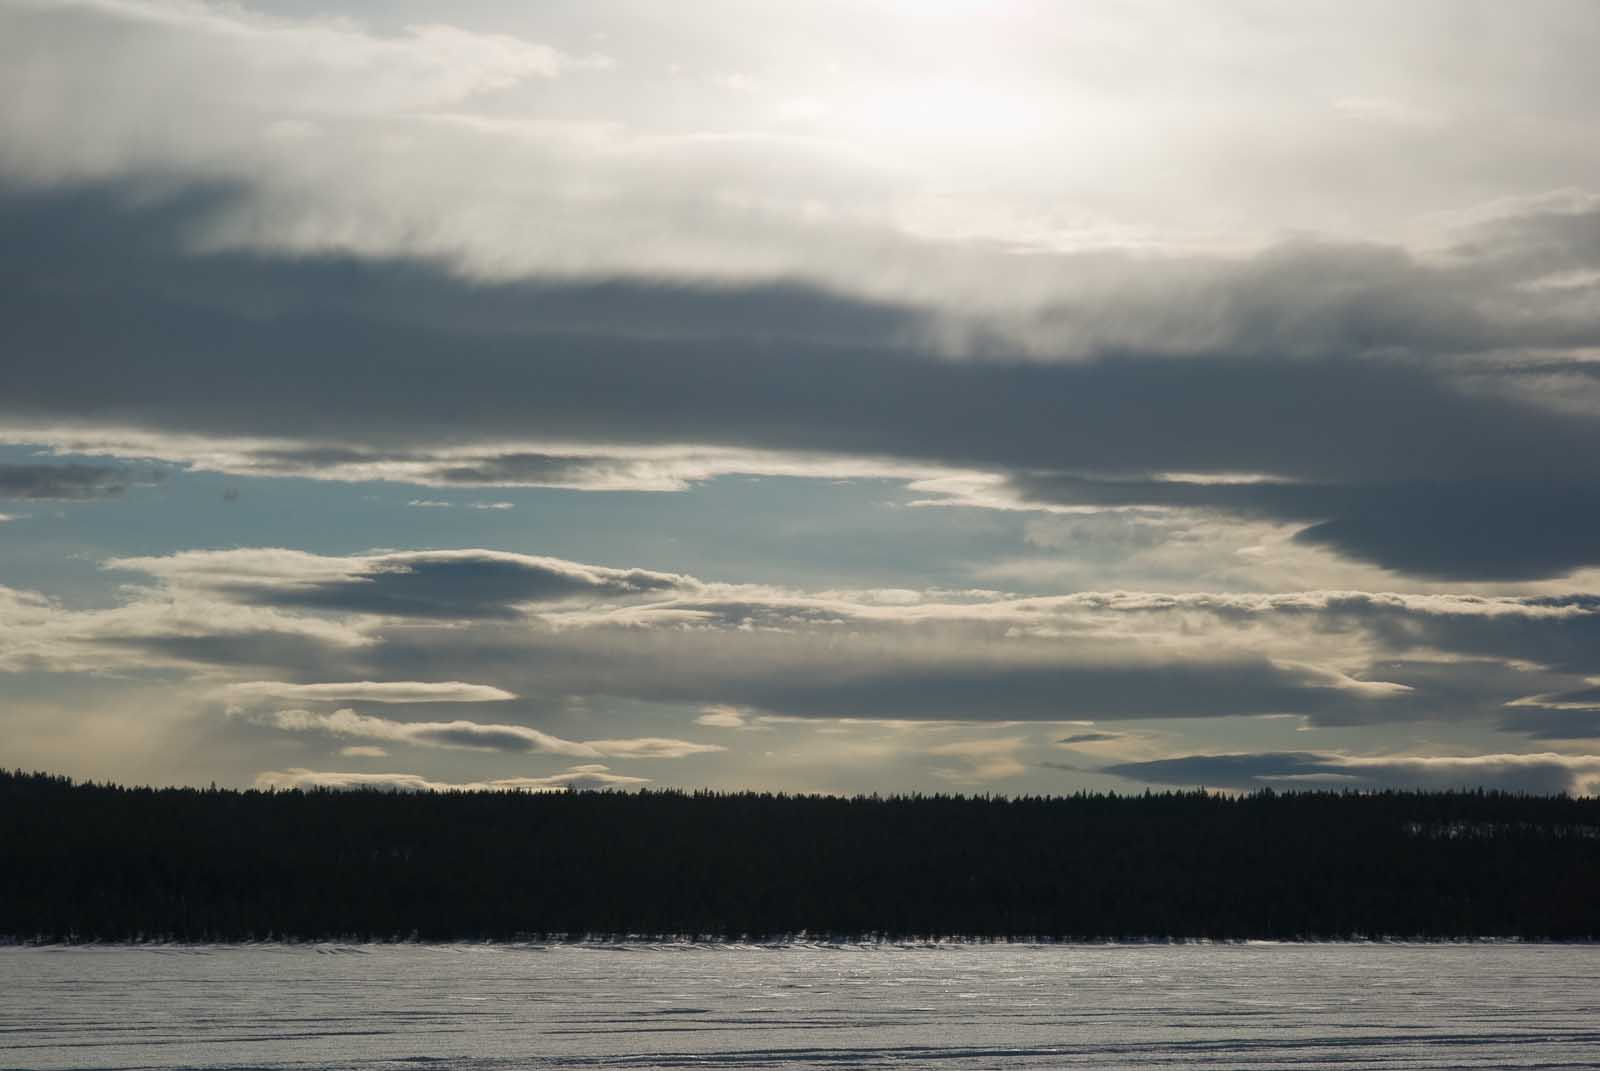 0401_jukkasjärvi_009